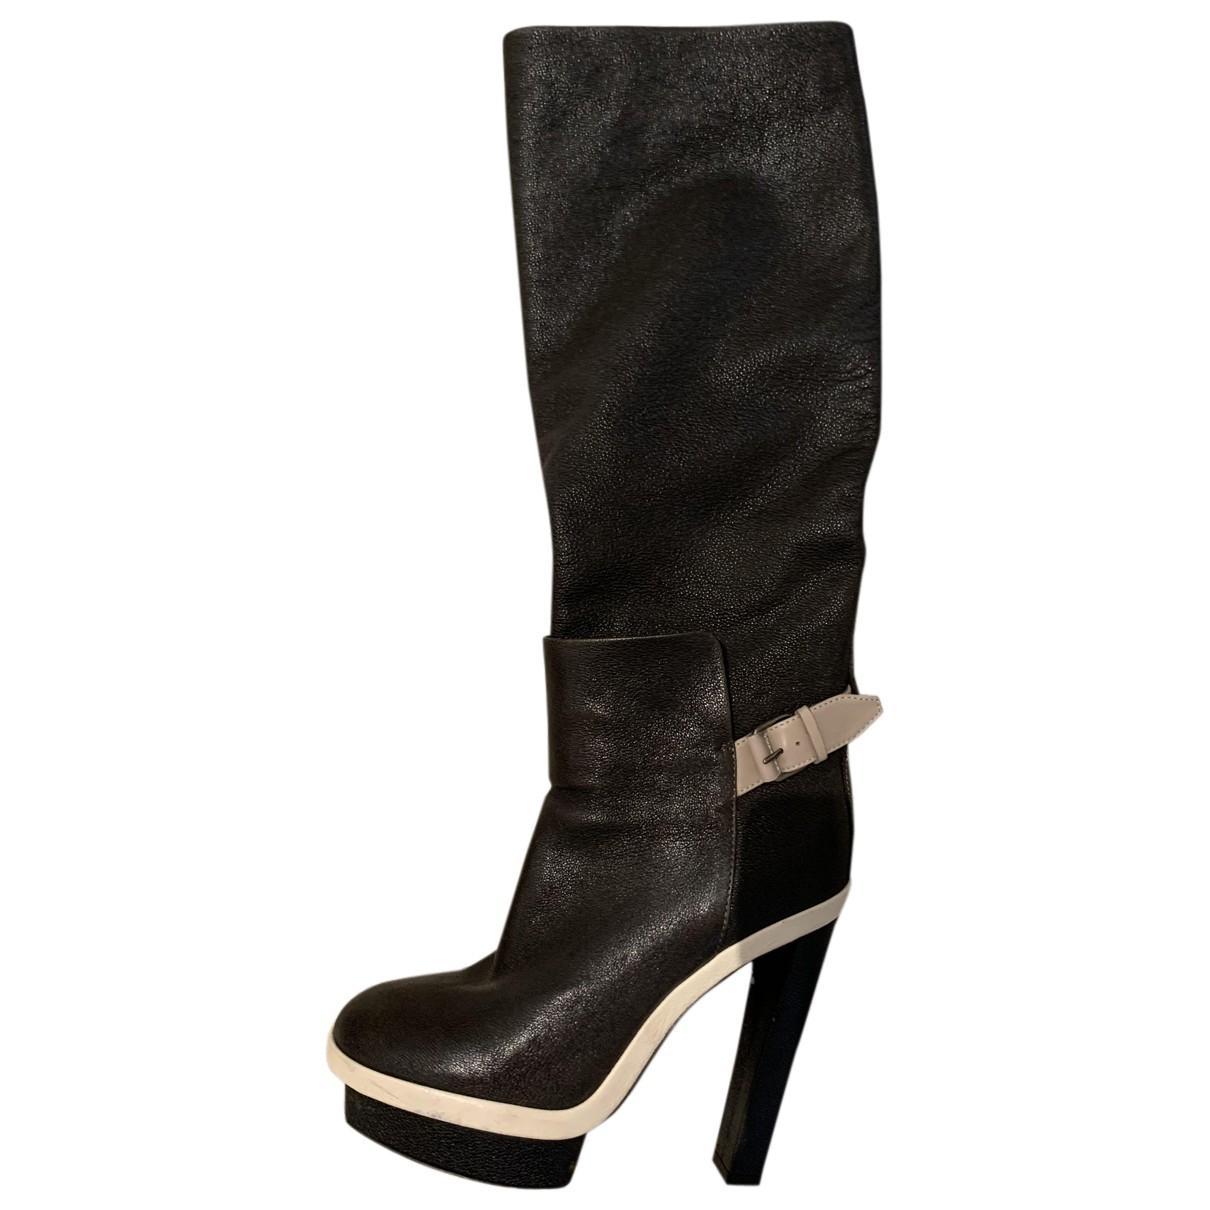 Balenciaga - Bottes   pour femme en cuir verni - anthracite